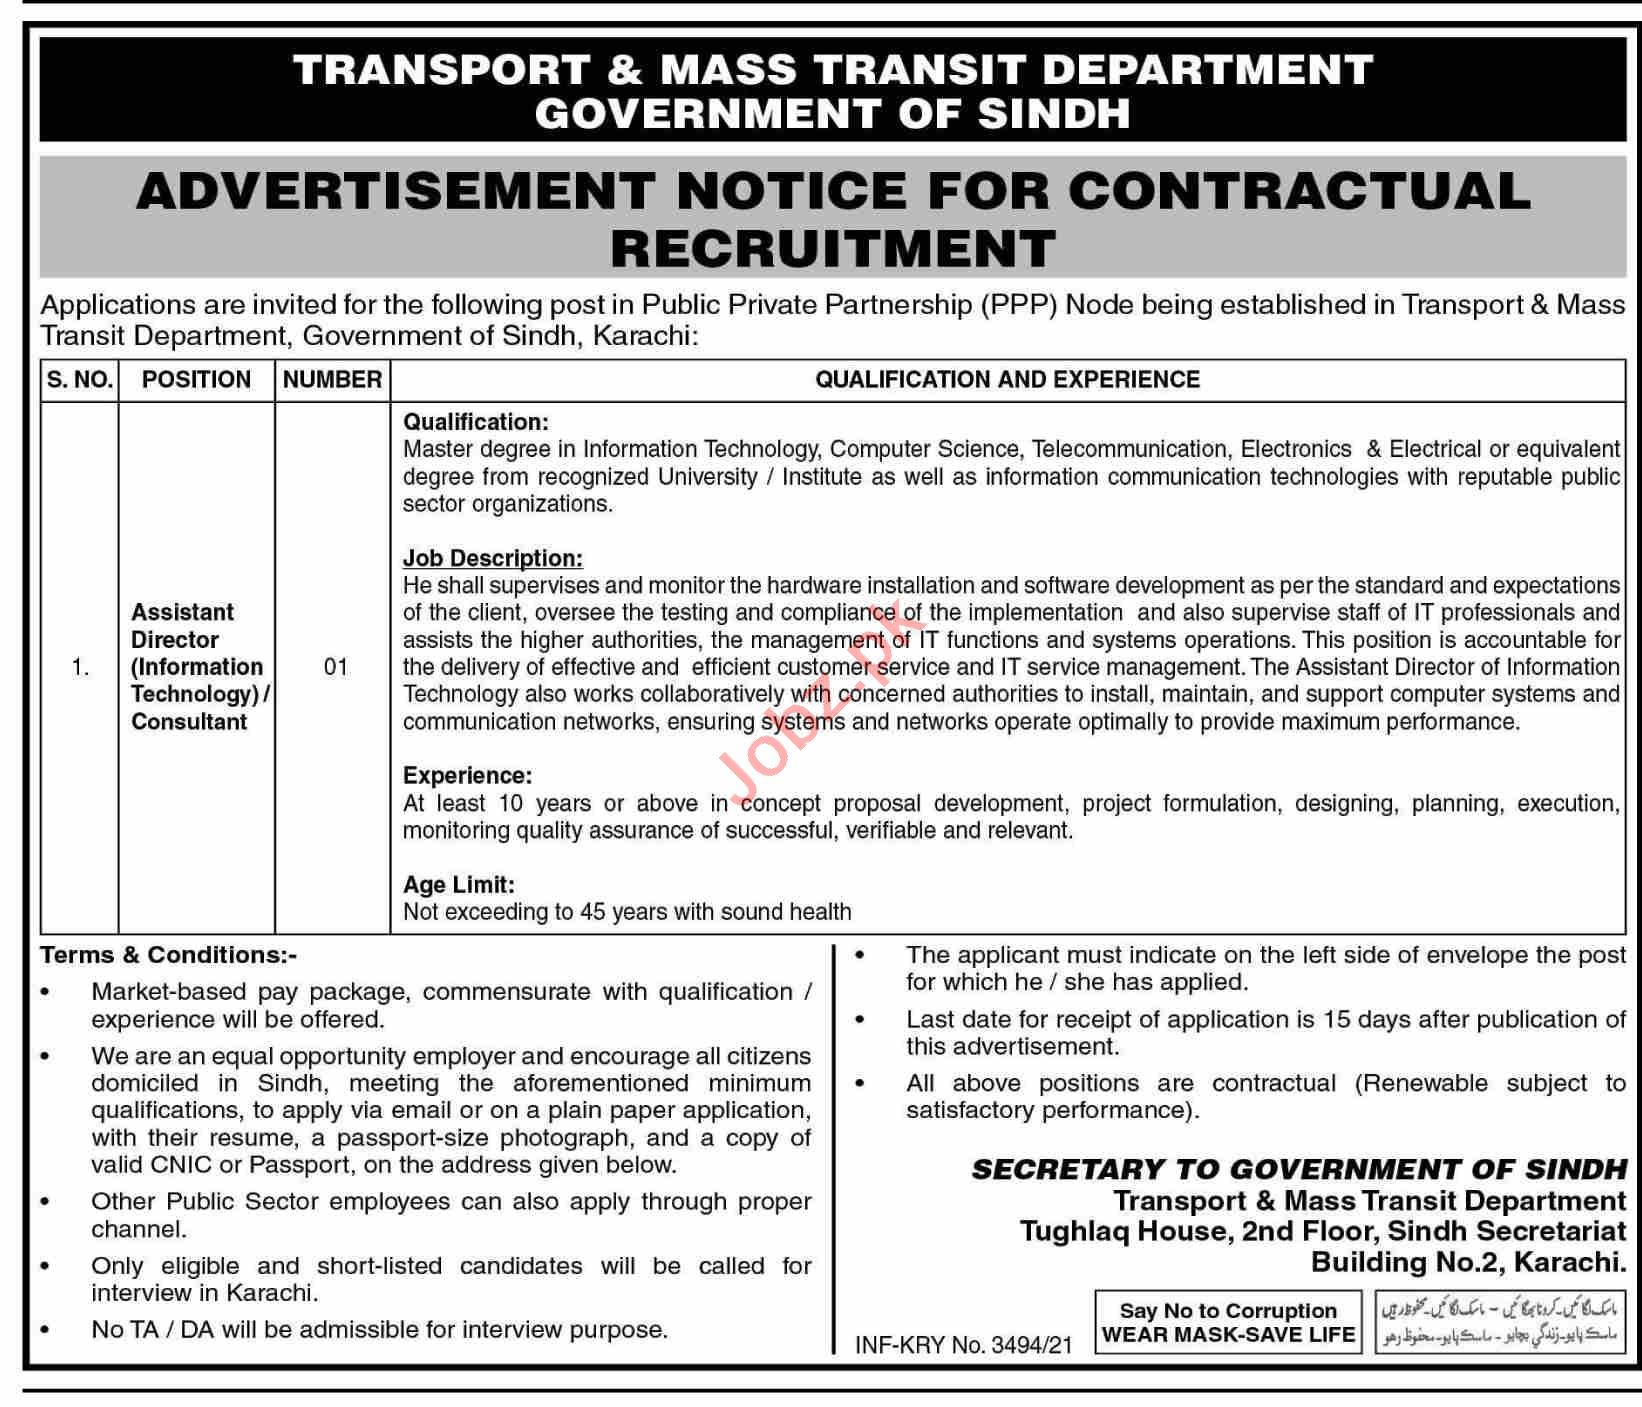 Jobs in Transport & Mass Transit Department